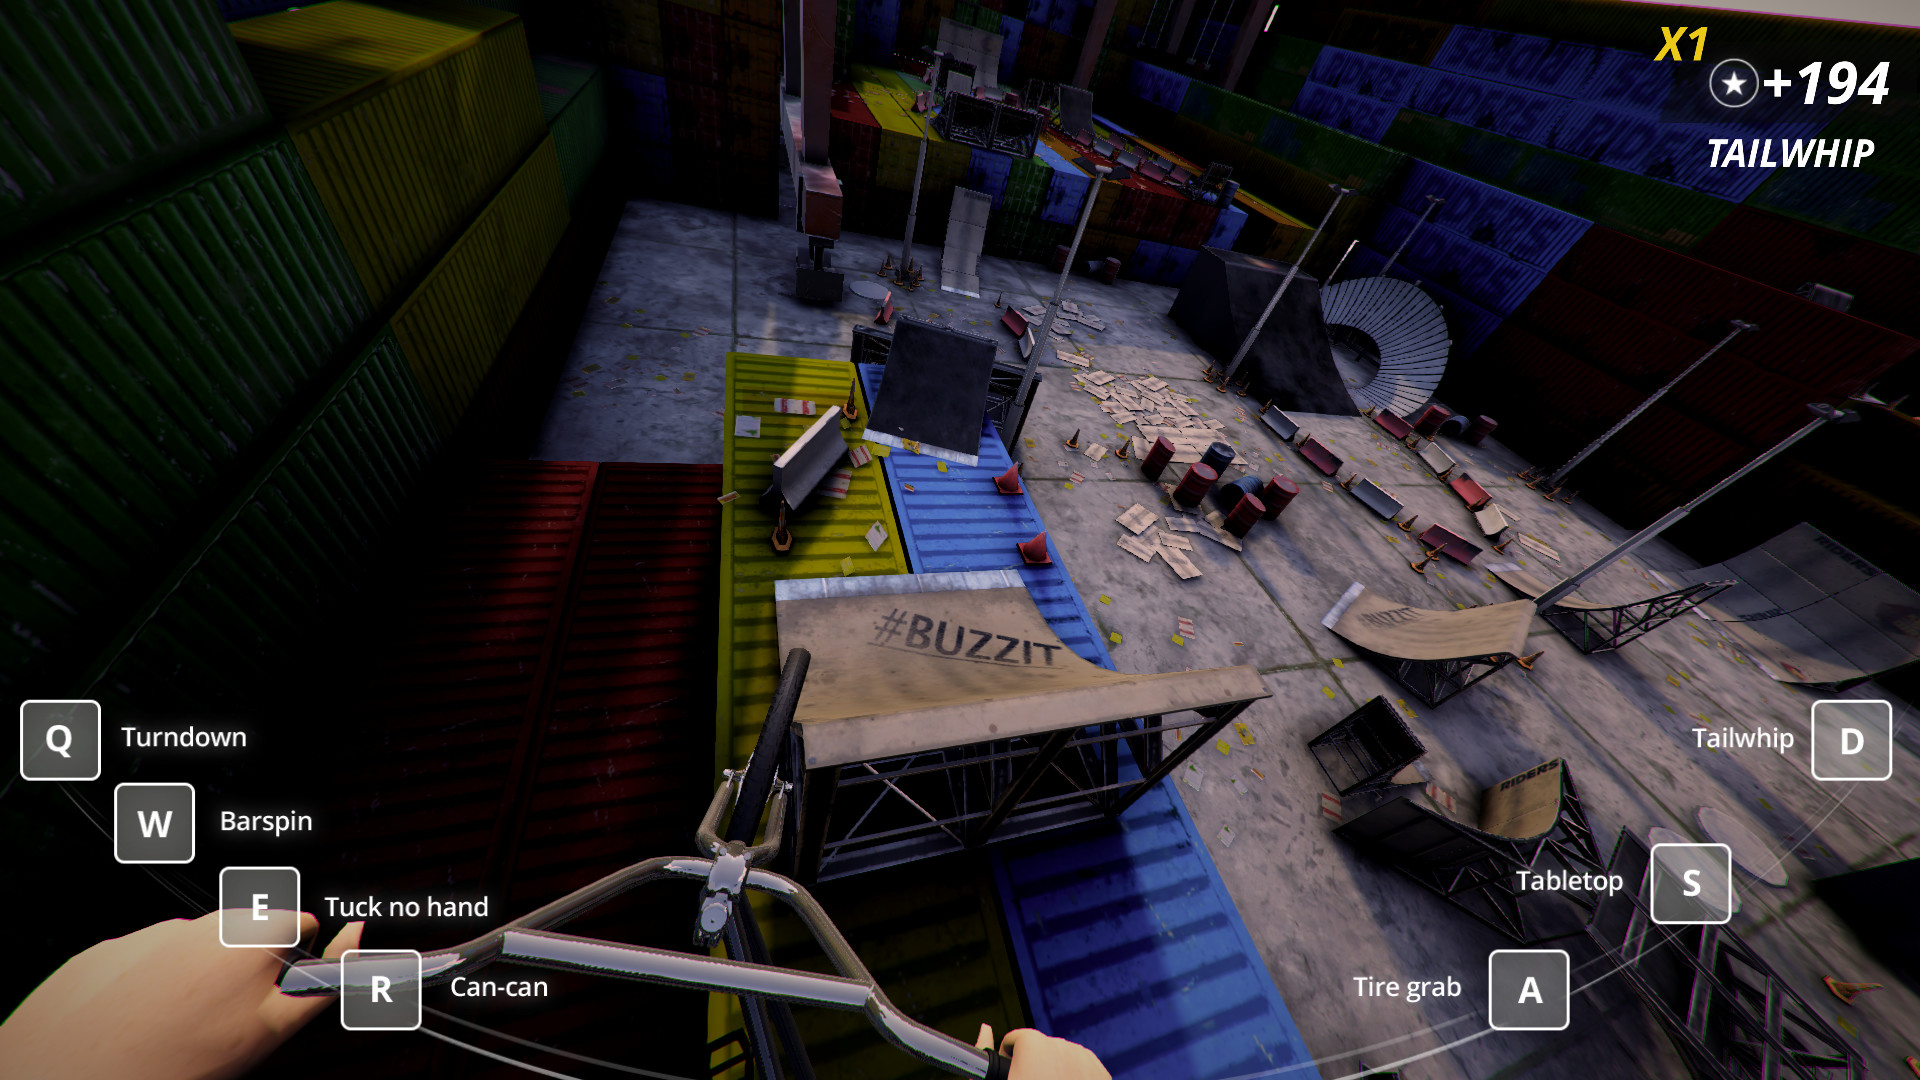 King Of Dirt Screenshot 3